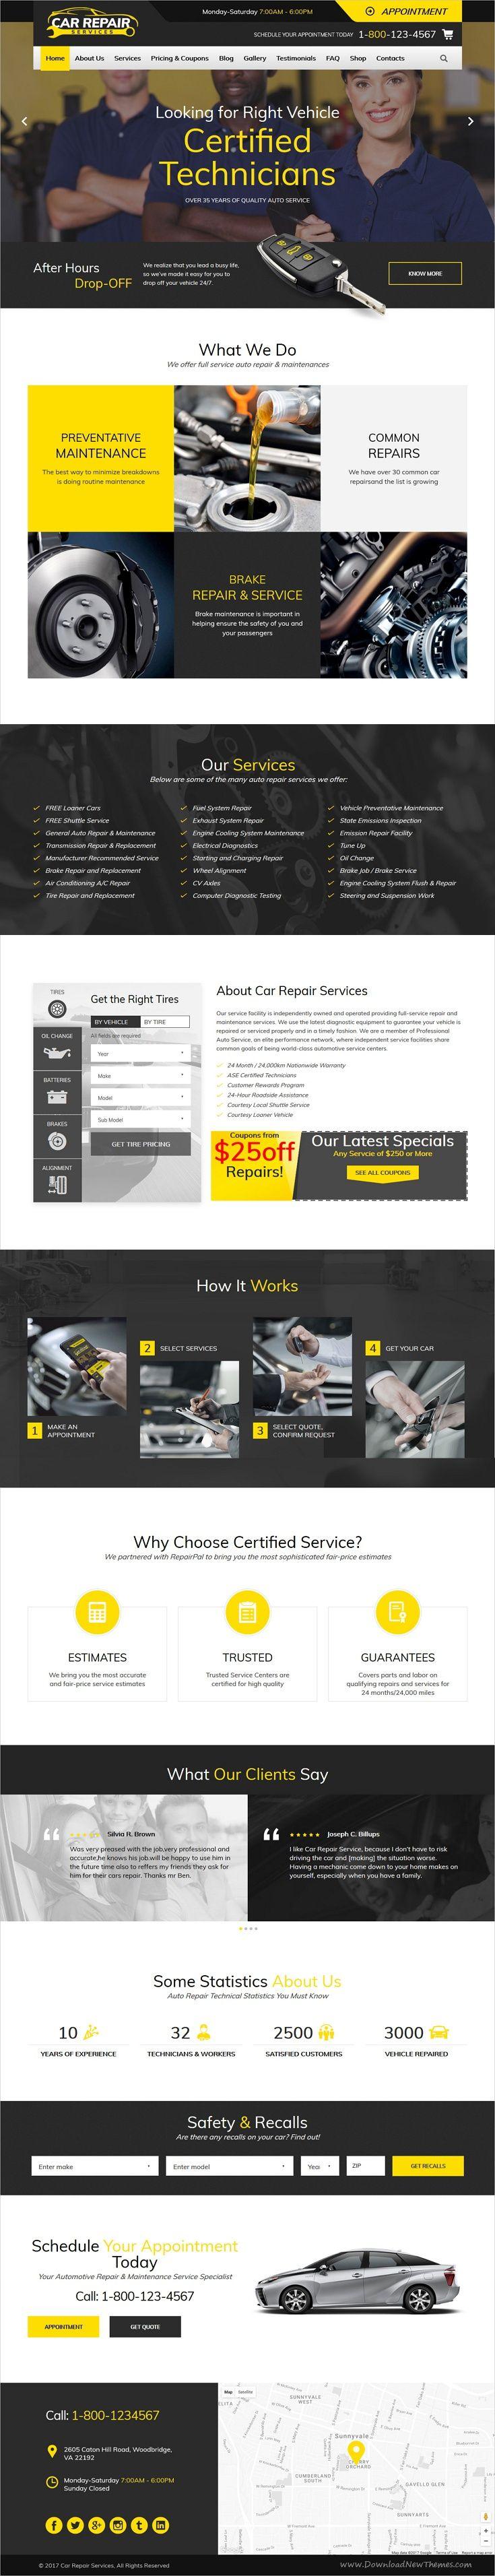 Car Repair Services Auto Mechanic Wordpress Theme Rtl Car Repair Service Car Mechanic Automotive Repair Shop